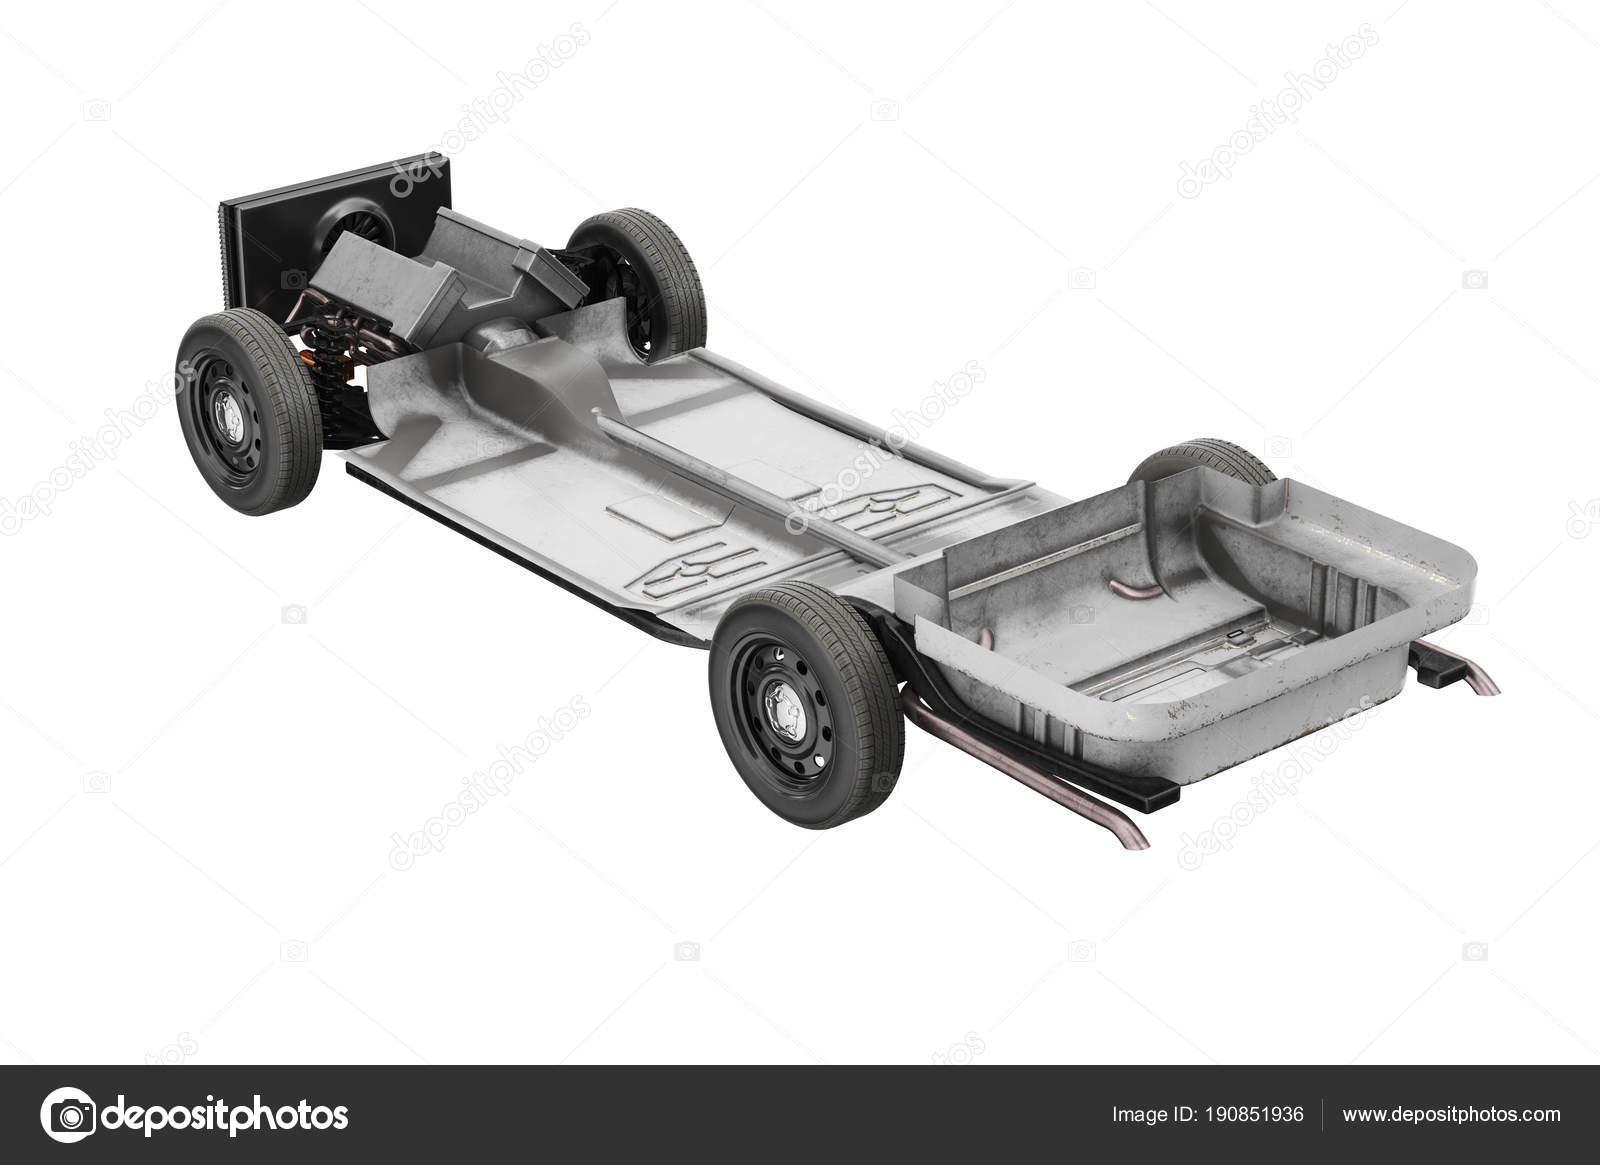 Chassis Rahmen Auto — Stockfoto © ARTYuSTUDIO #190851936